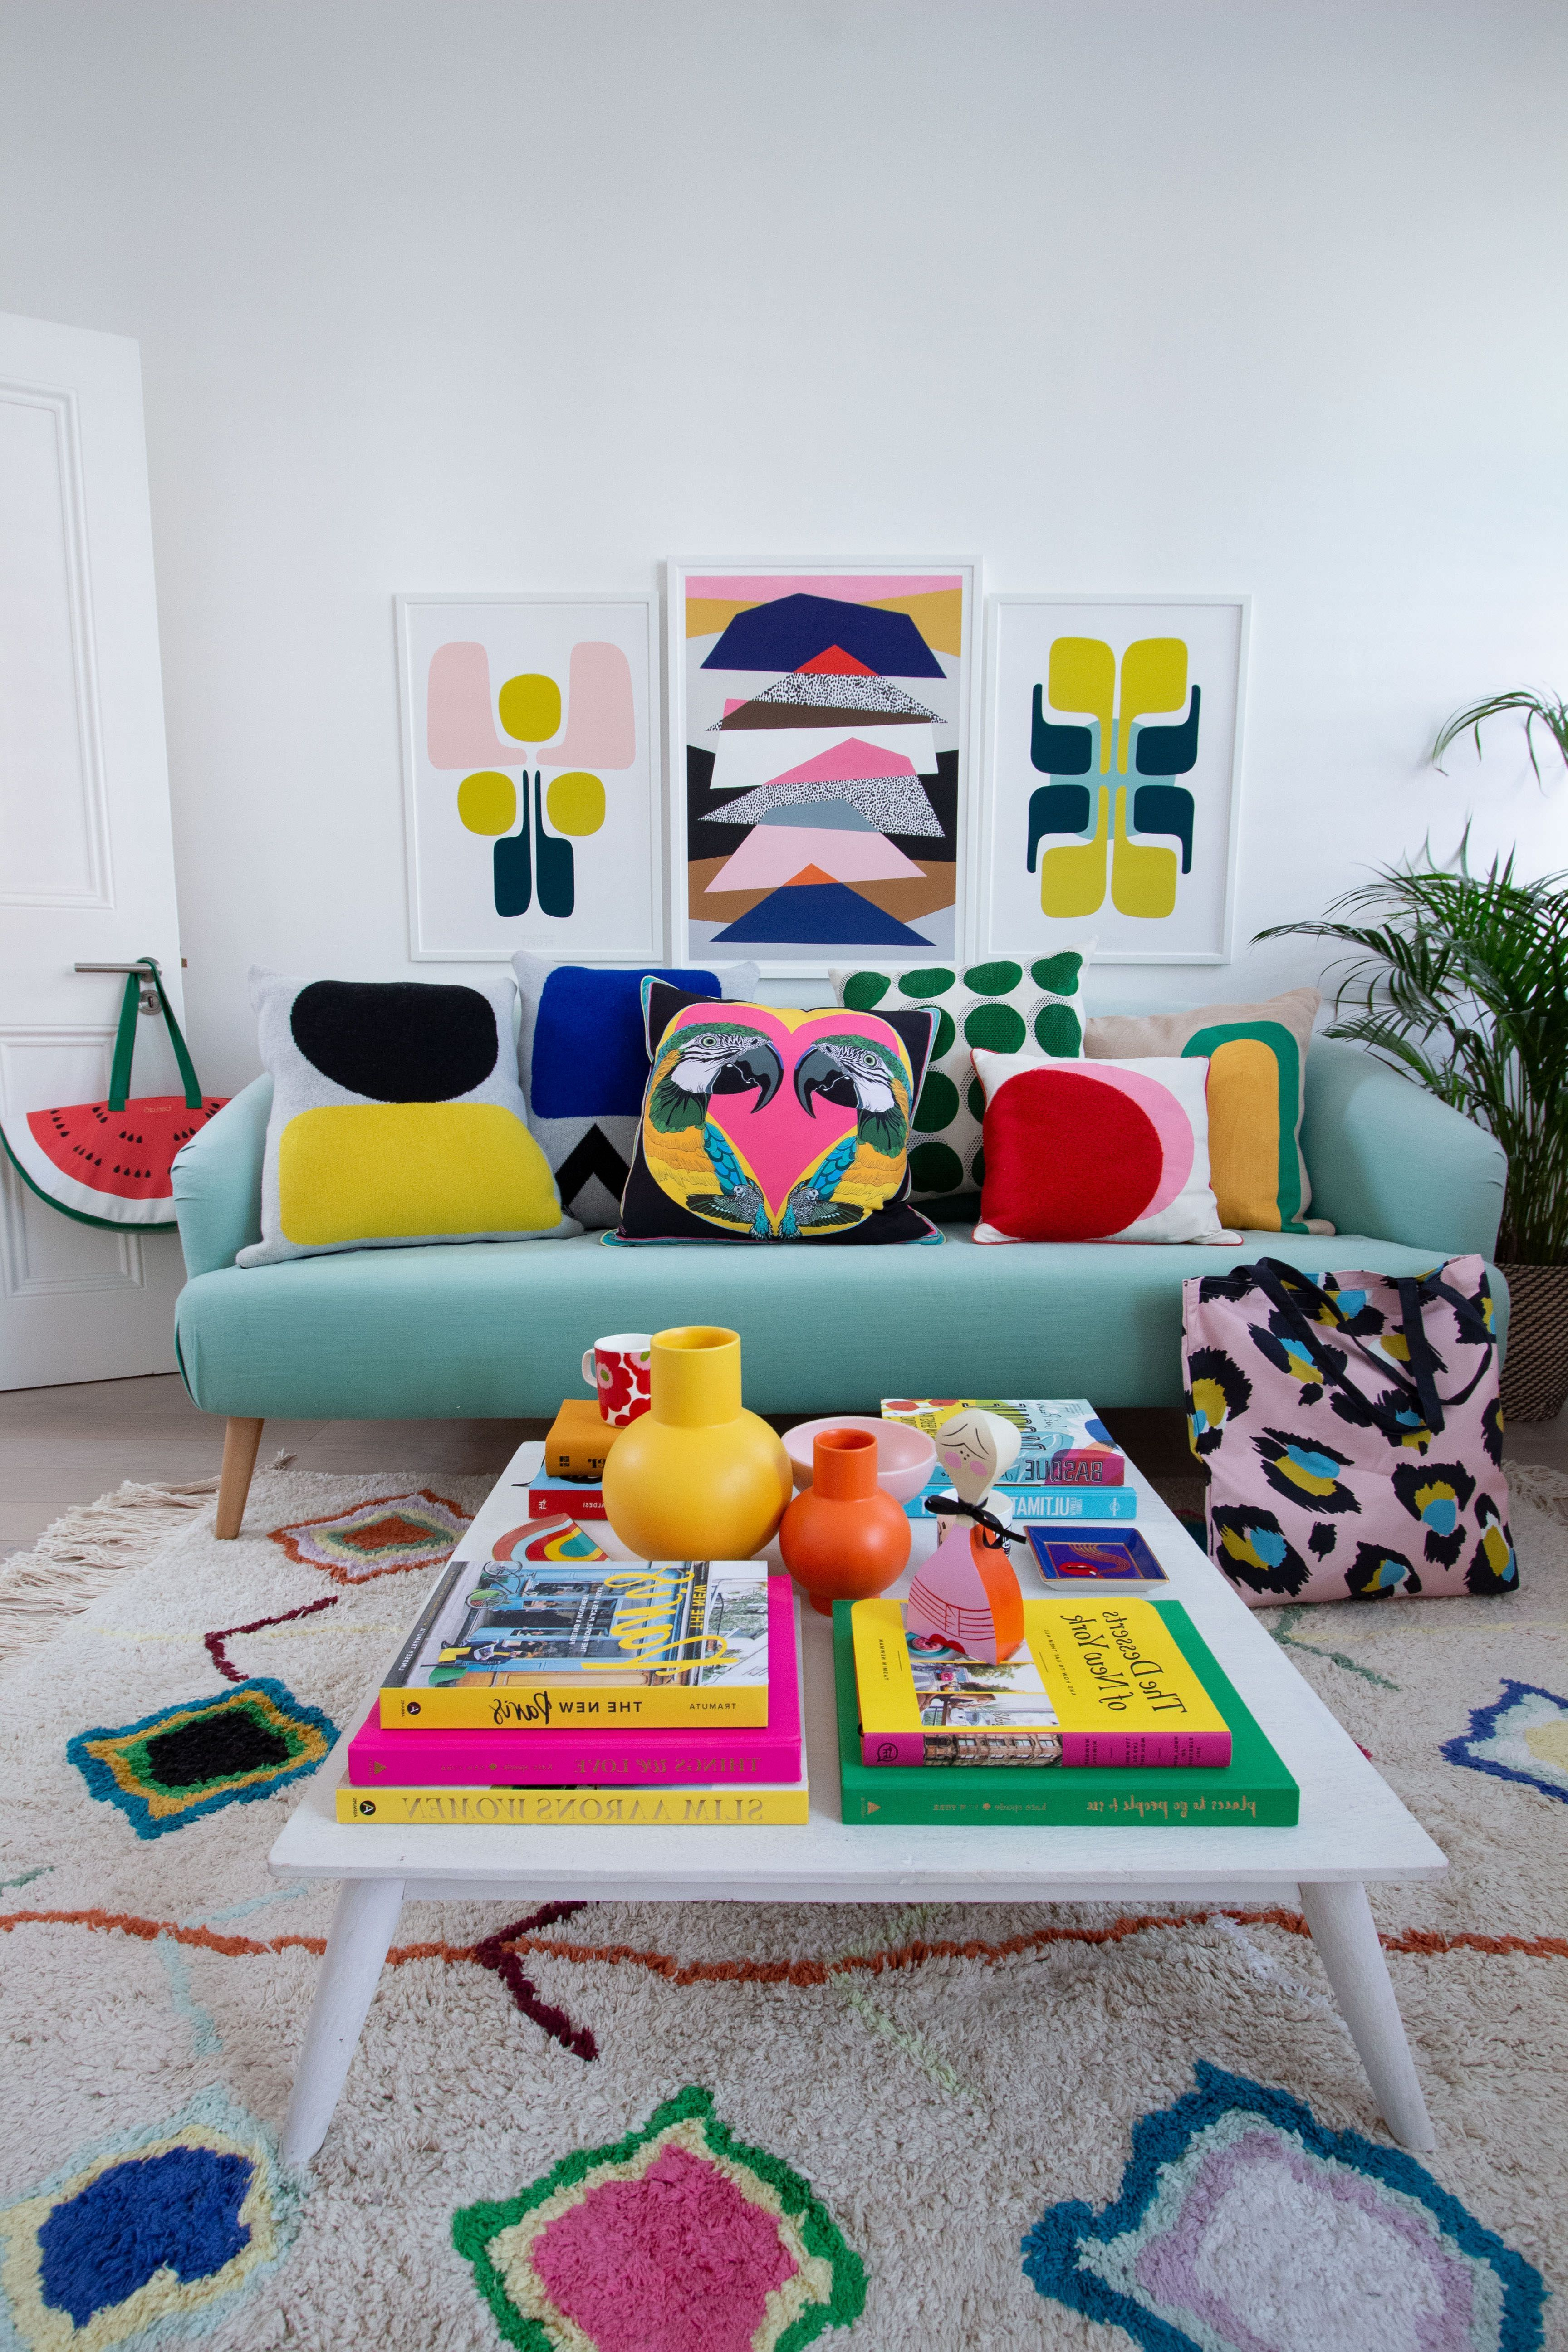 Living Room Retro Style Living Room Retrostylelivingroom In 2020 Living Room Decor Colors Retro Living Rooms Colourful Living Room Decor #retro #style #living #room